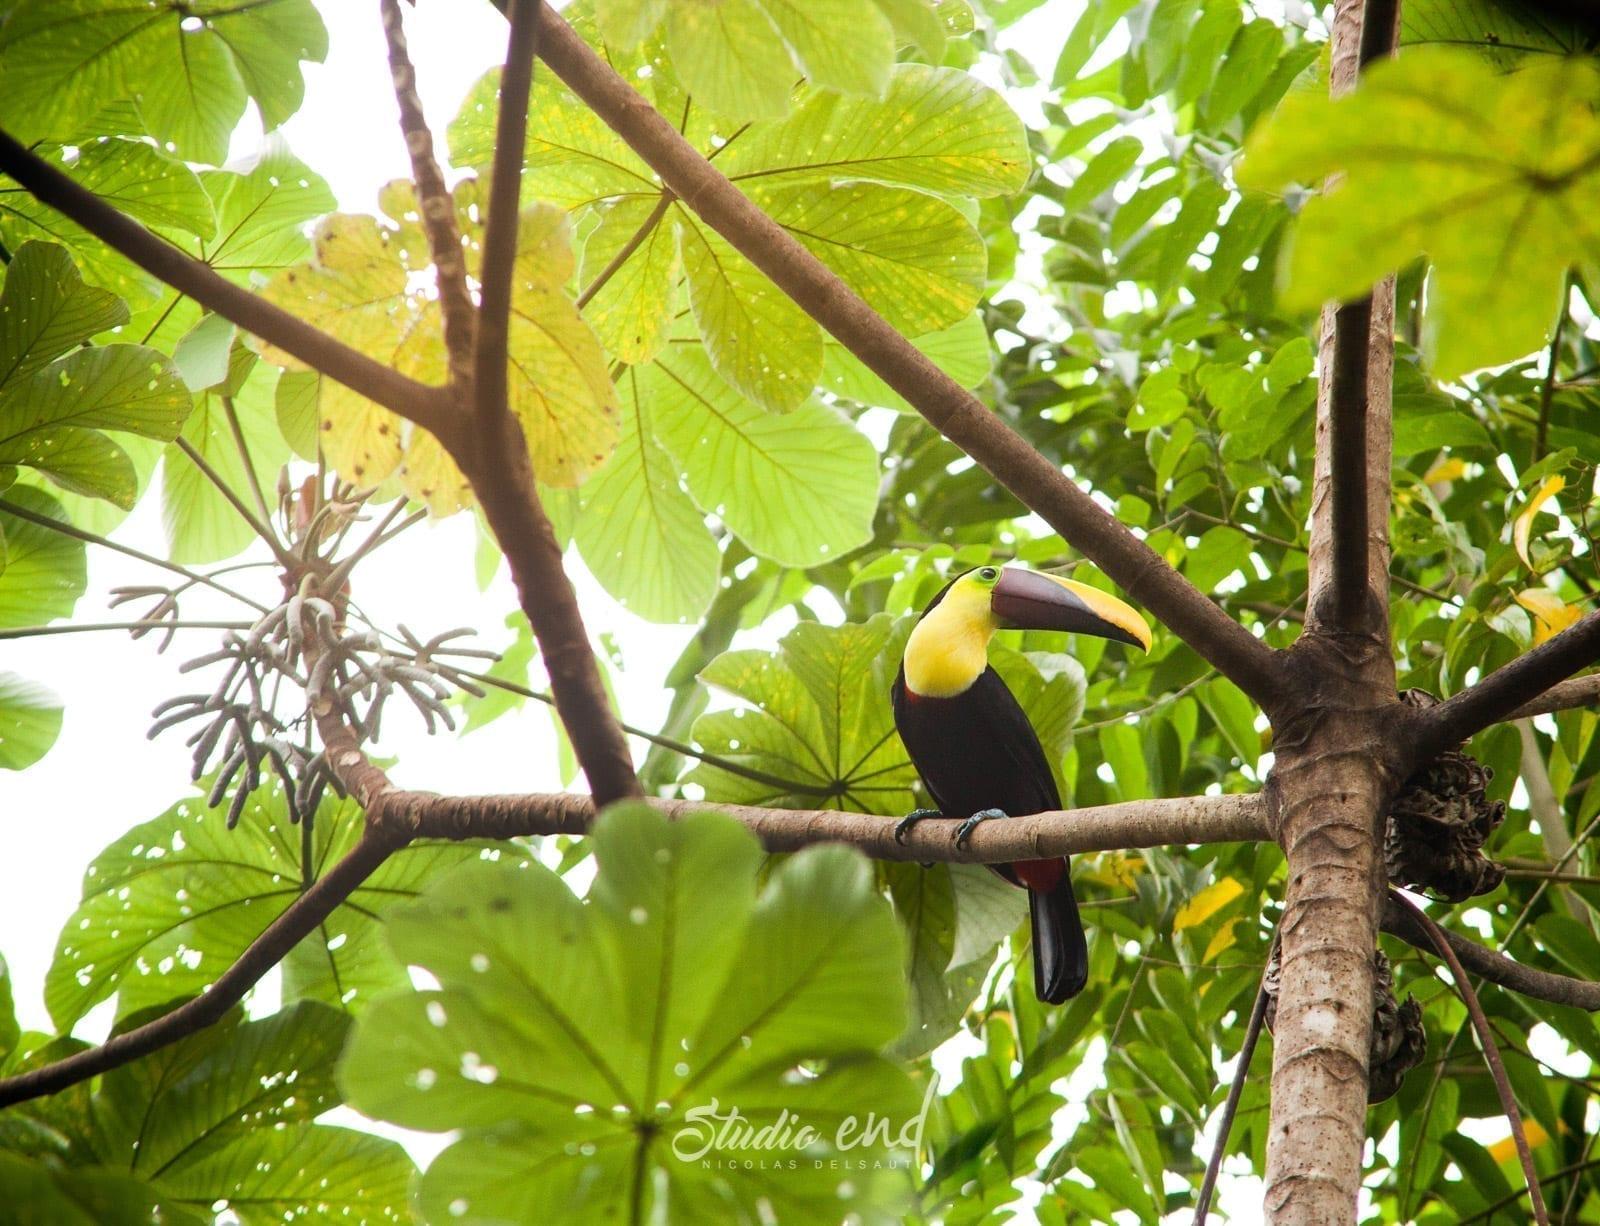 Photographe et reportage de voyage, animalier Toucan Costa Rica Nicolas Delsaut